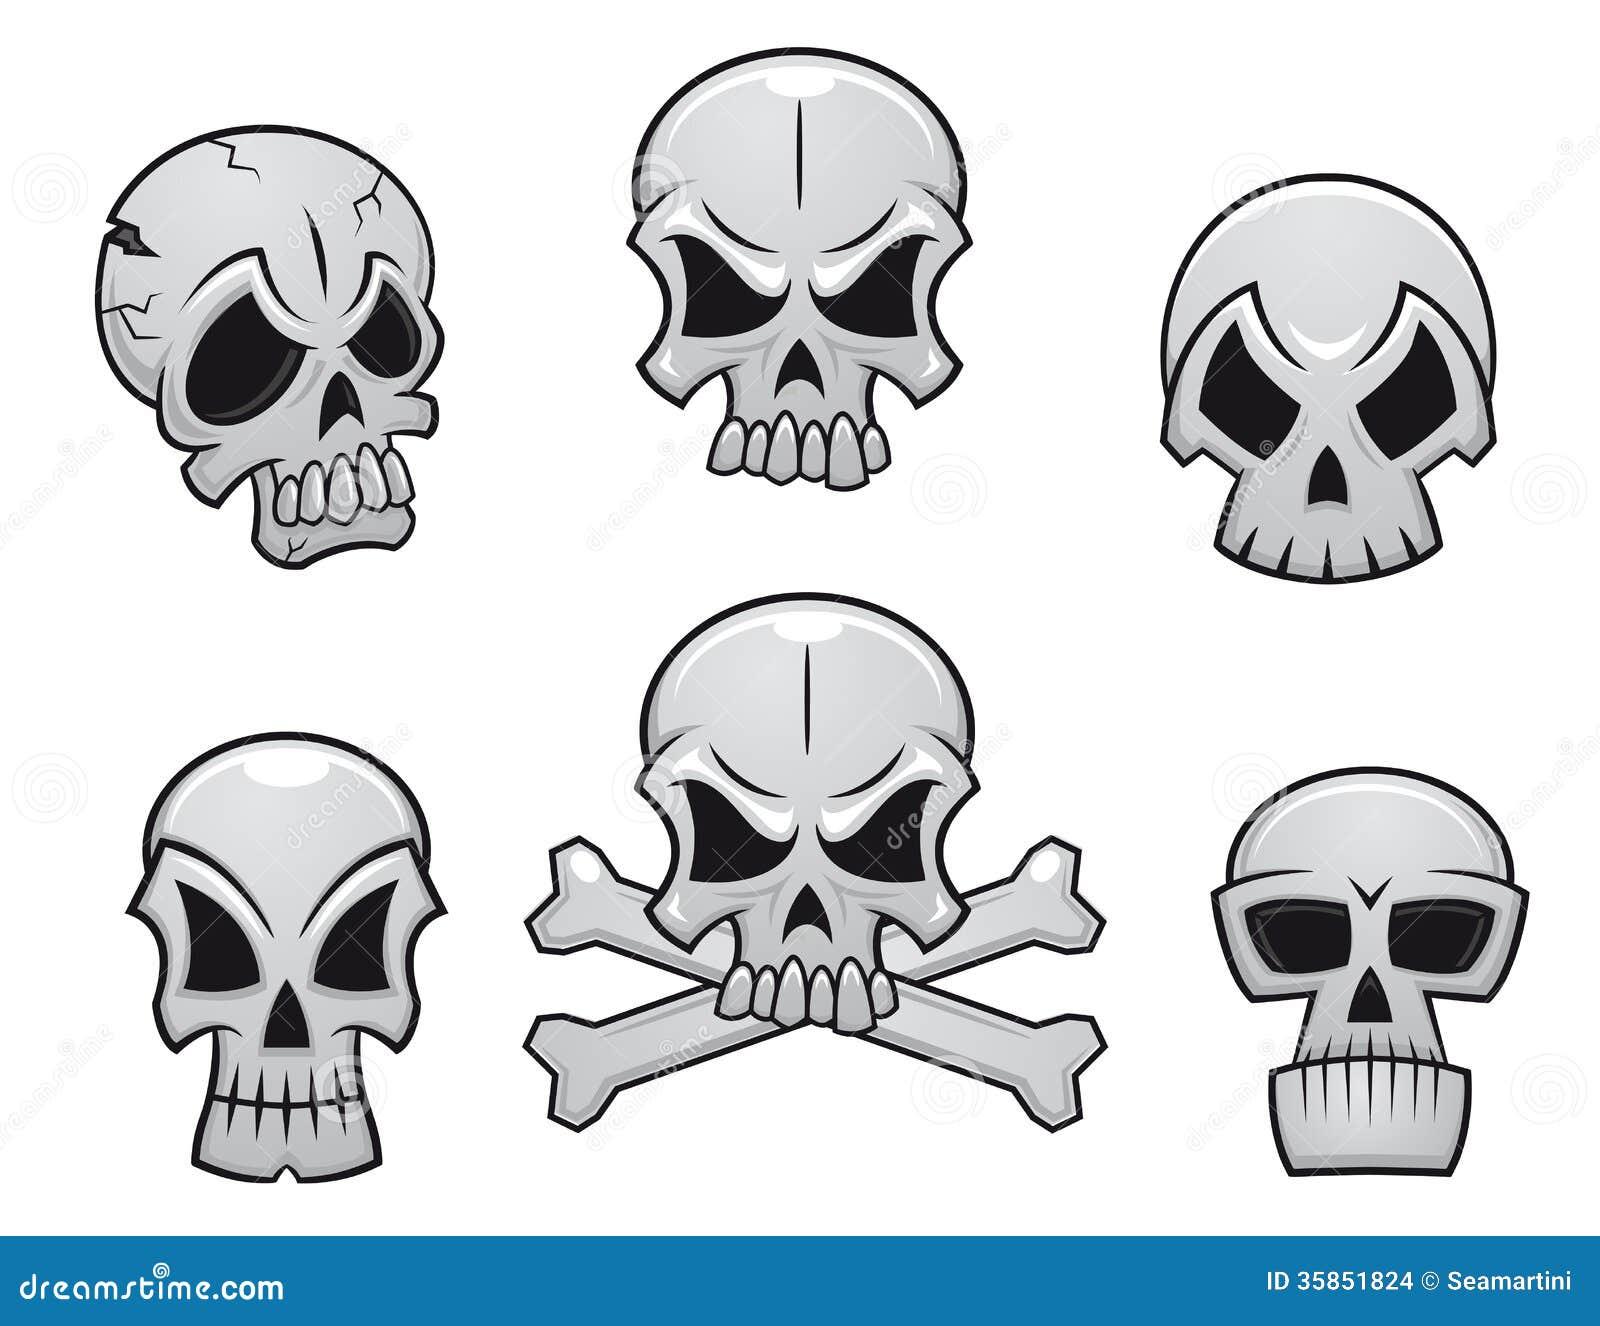 Cartoon skulls set for scary, hallooween or another danger concept ...